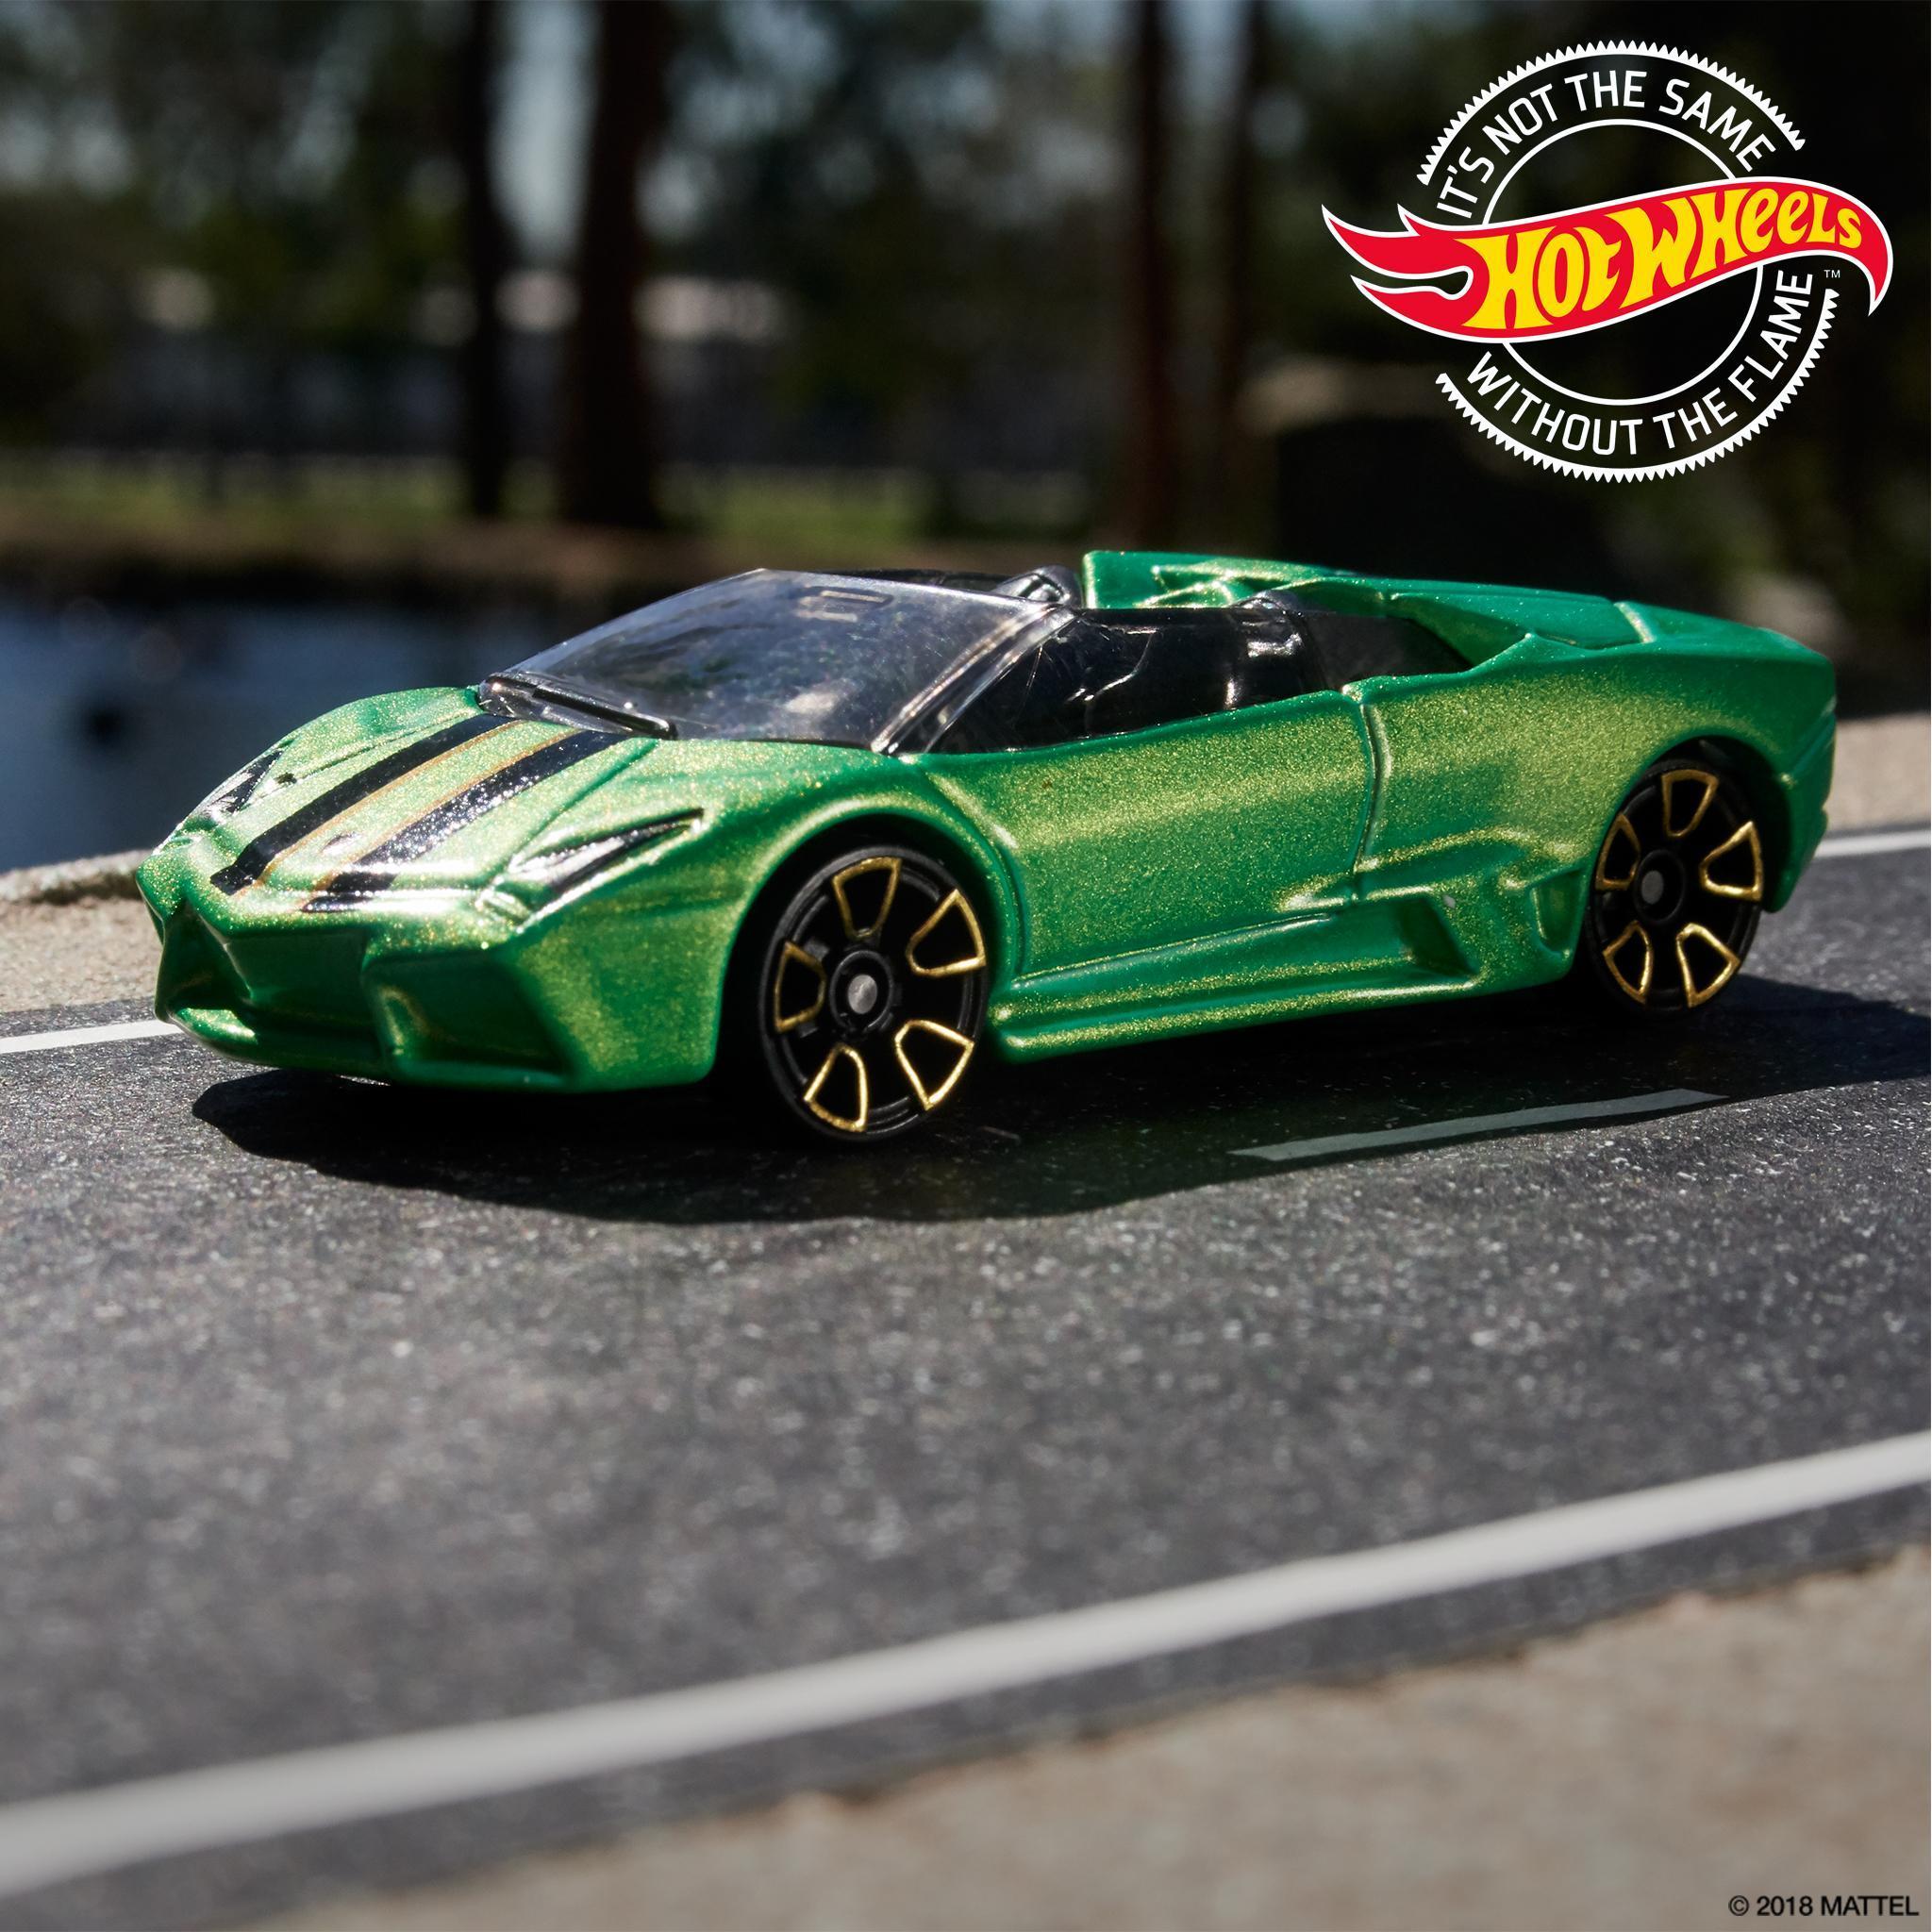 Hot Wheels Twitter Tweet Top Down With This Green Lamborghini